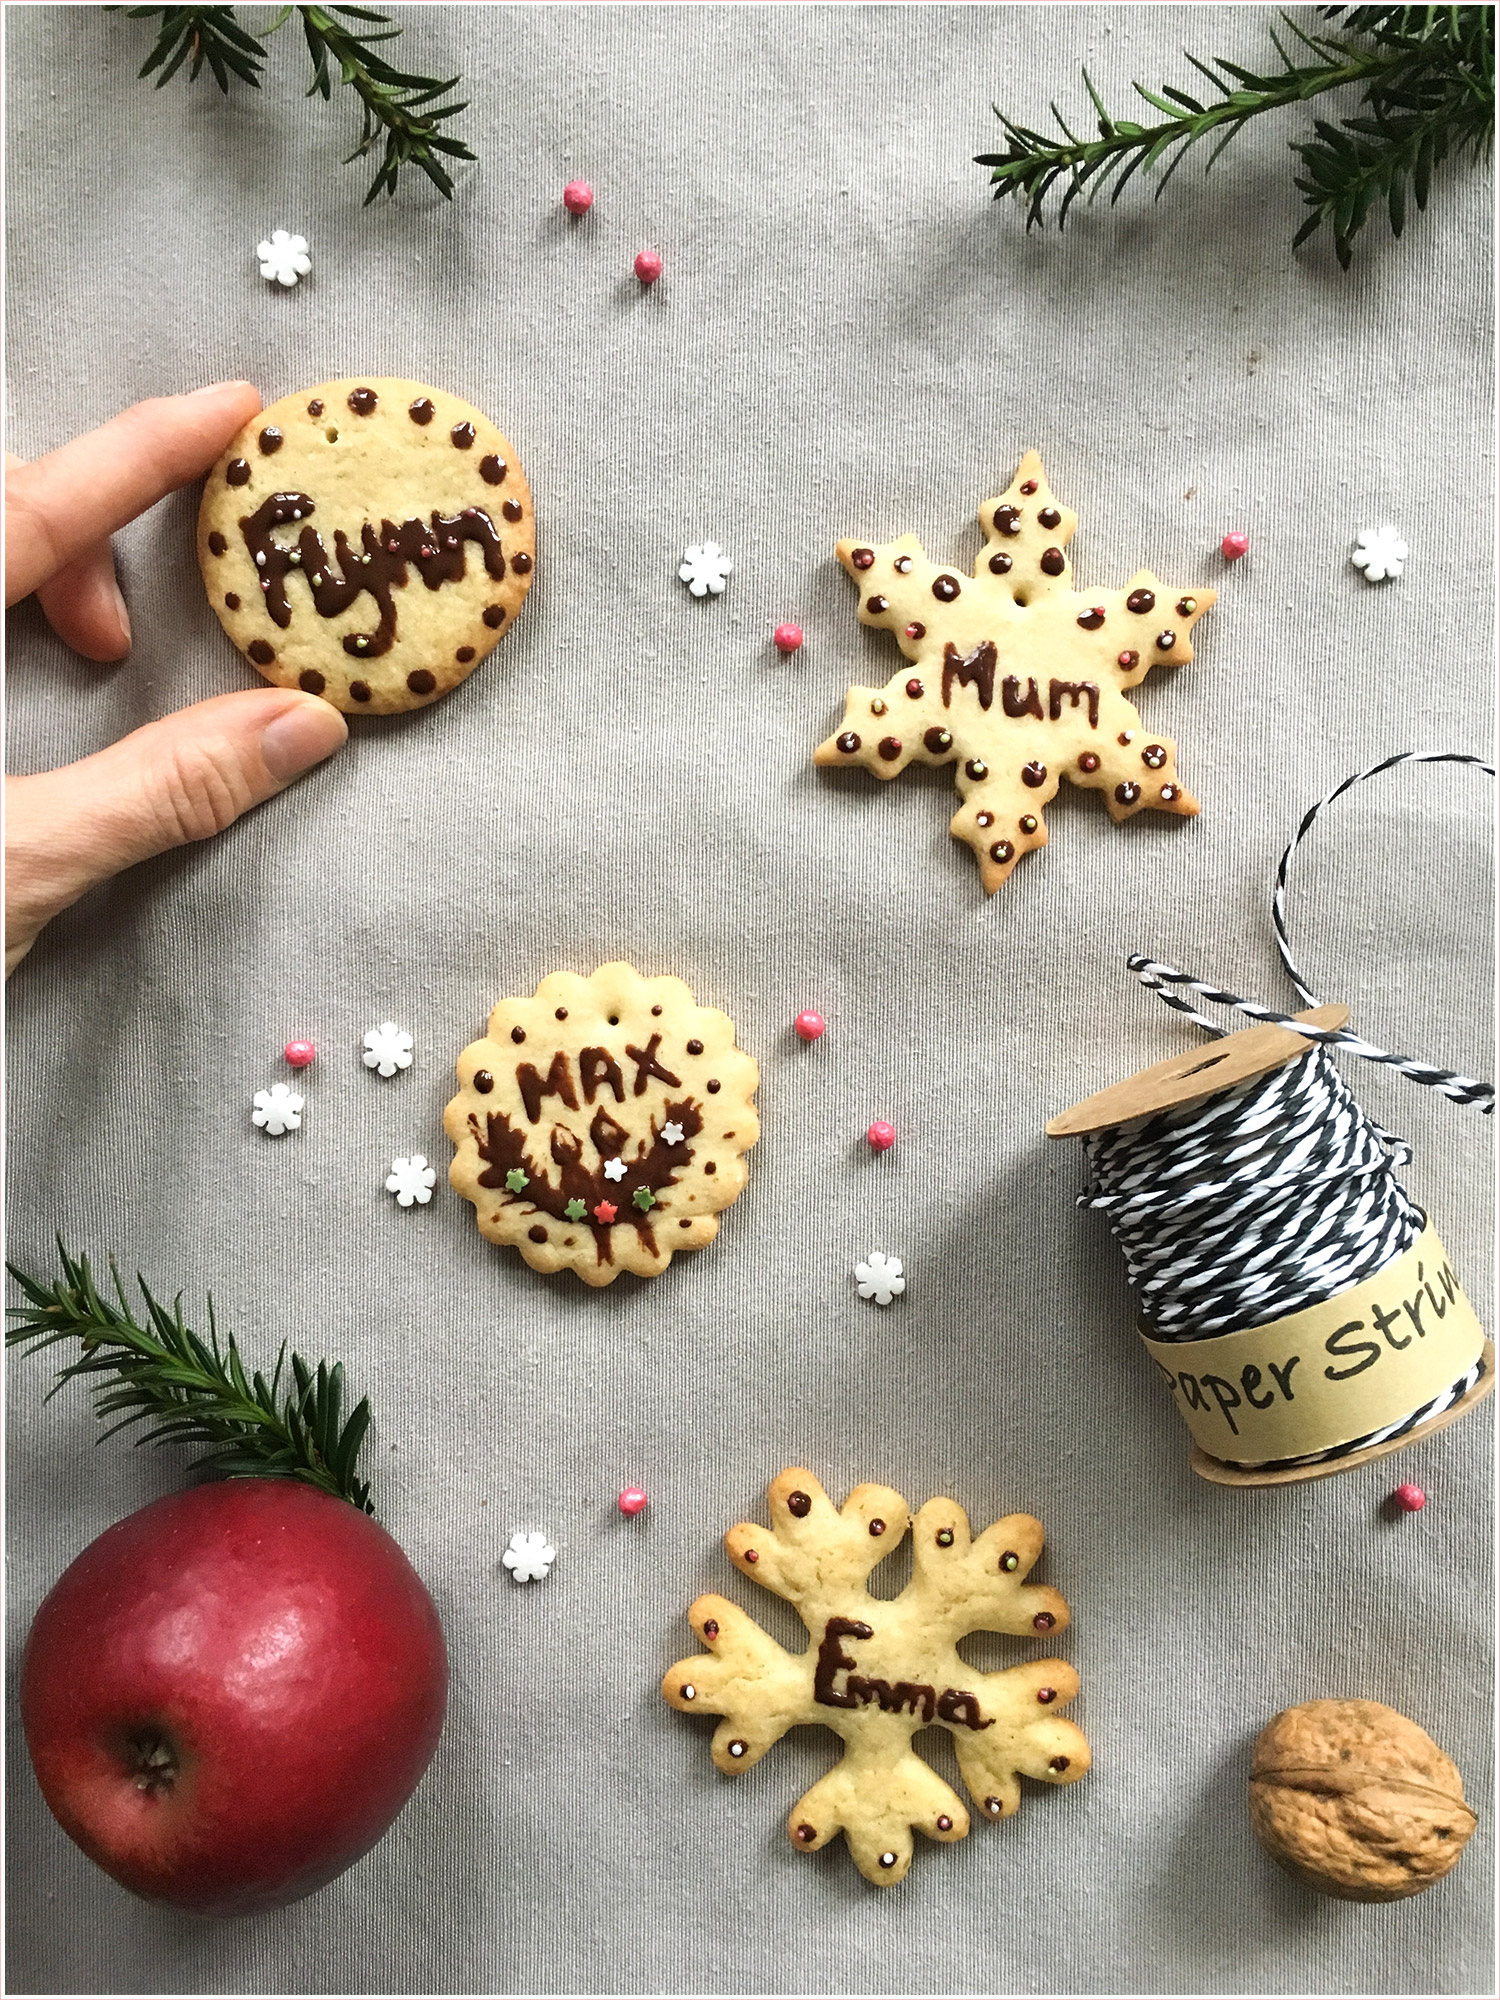 Eco-friendly gift wrap ideas.   PearTreePond Blog #creative #ecofriendly #giftwrap #giftwrapping